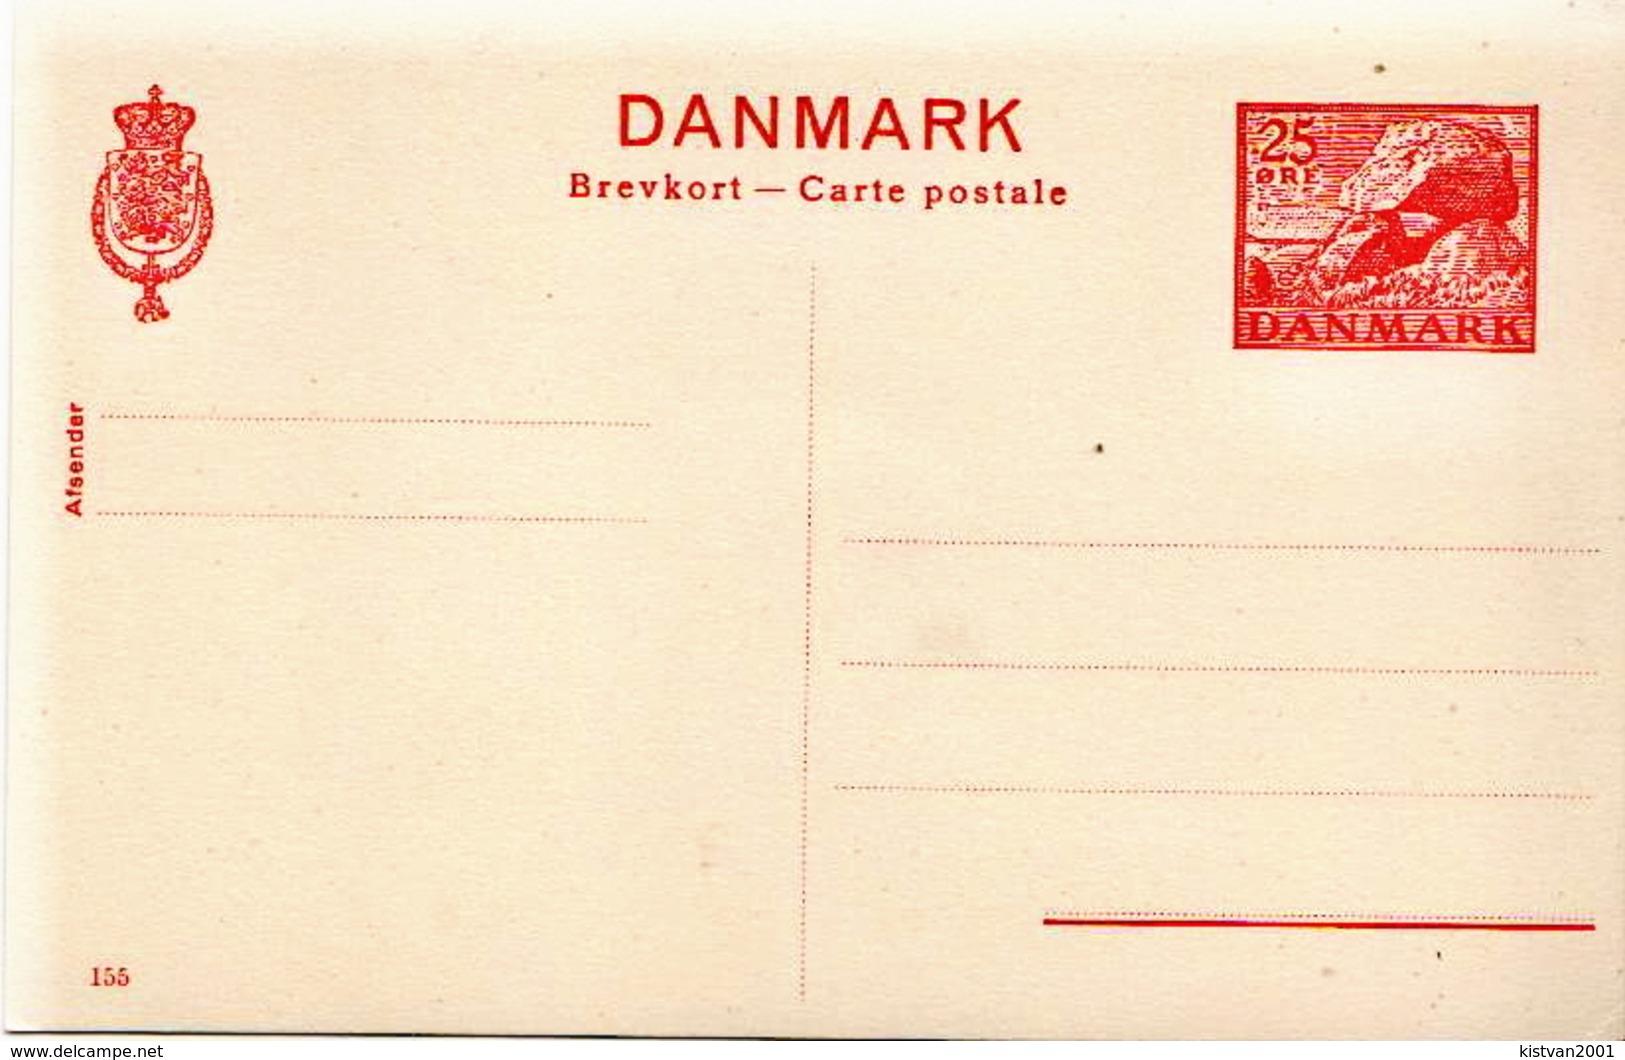 Postal History Cover: Denmark Mint Postal Stationery Card Nr 155, 25 öre - Postwaardestukken